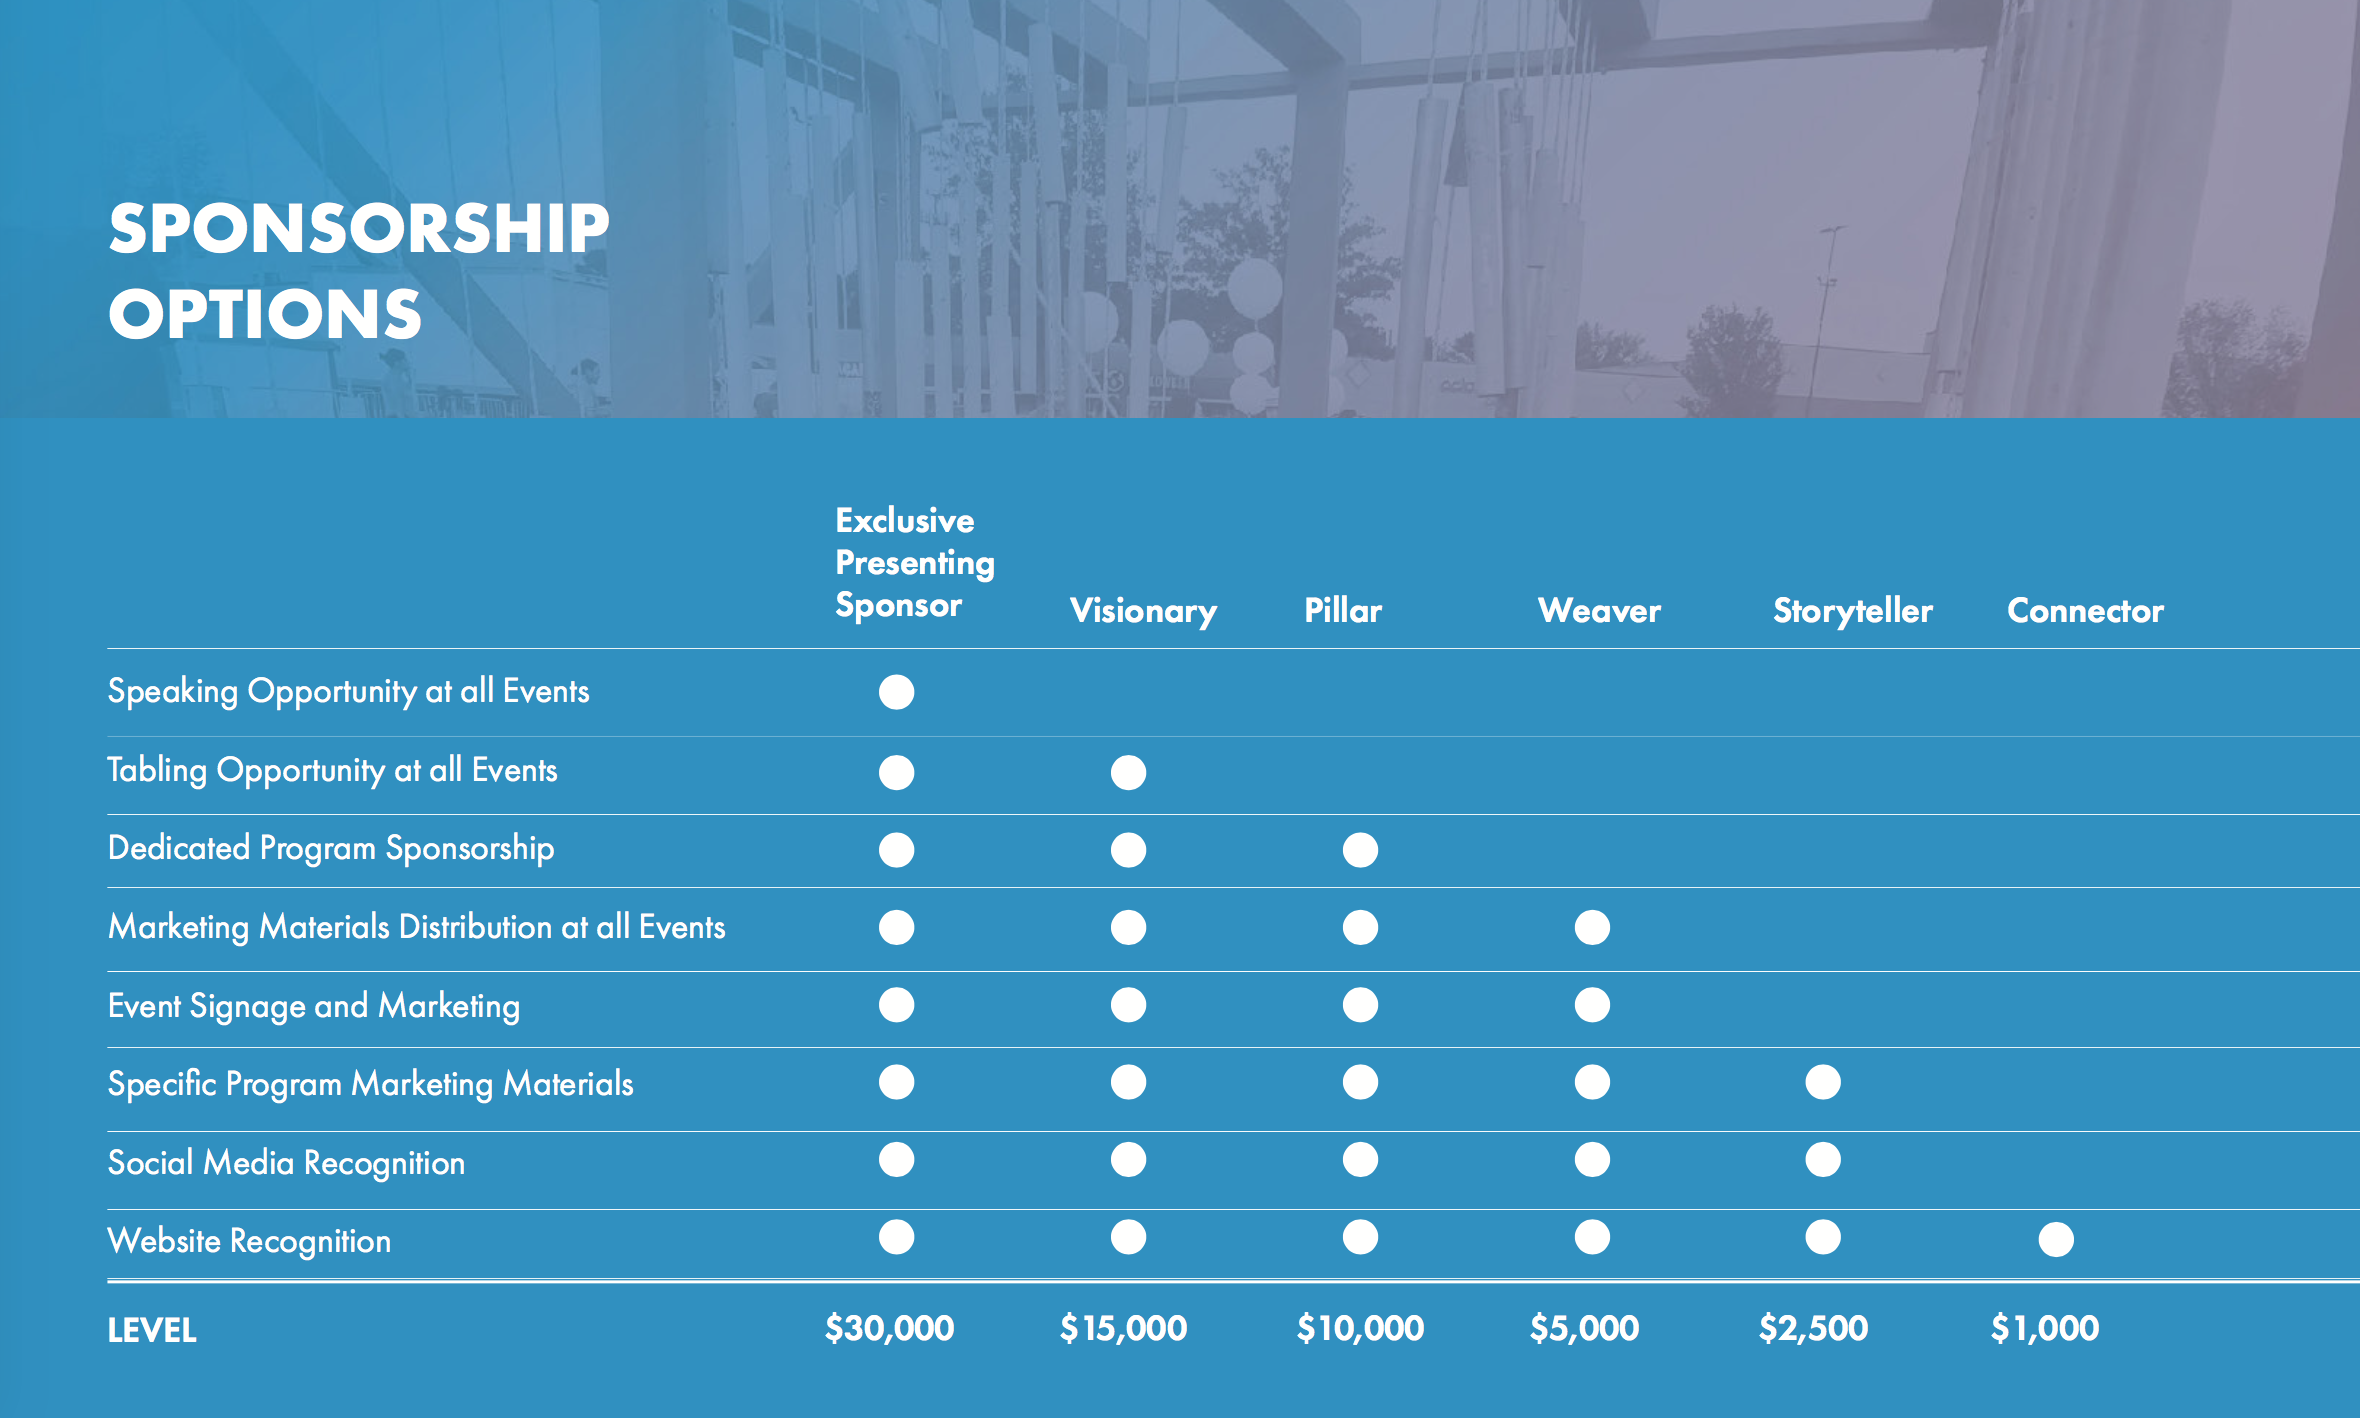 SponsorshipOptions1.png